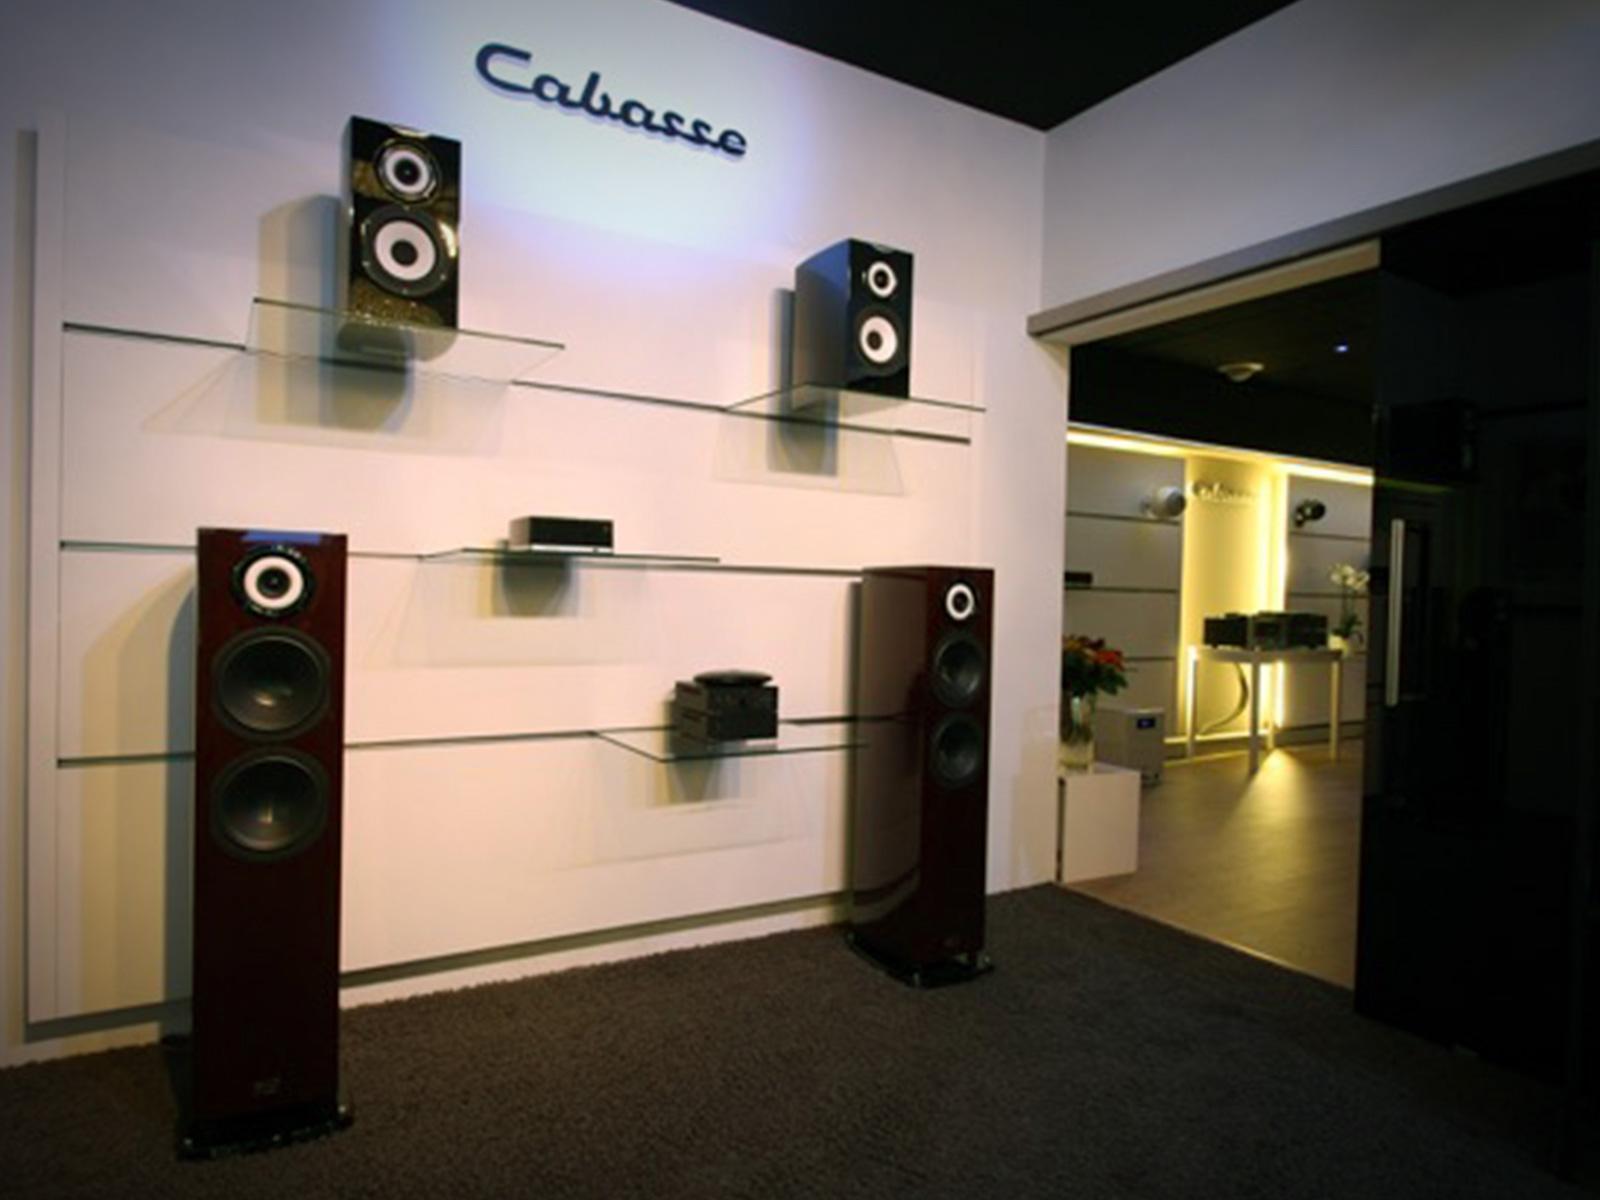 Soundmuse-Cabasse6